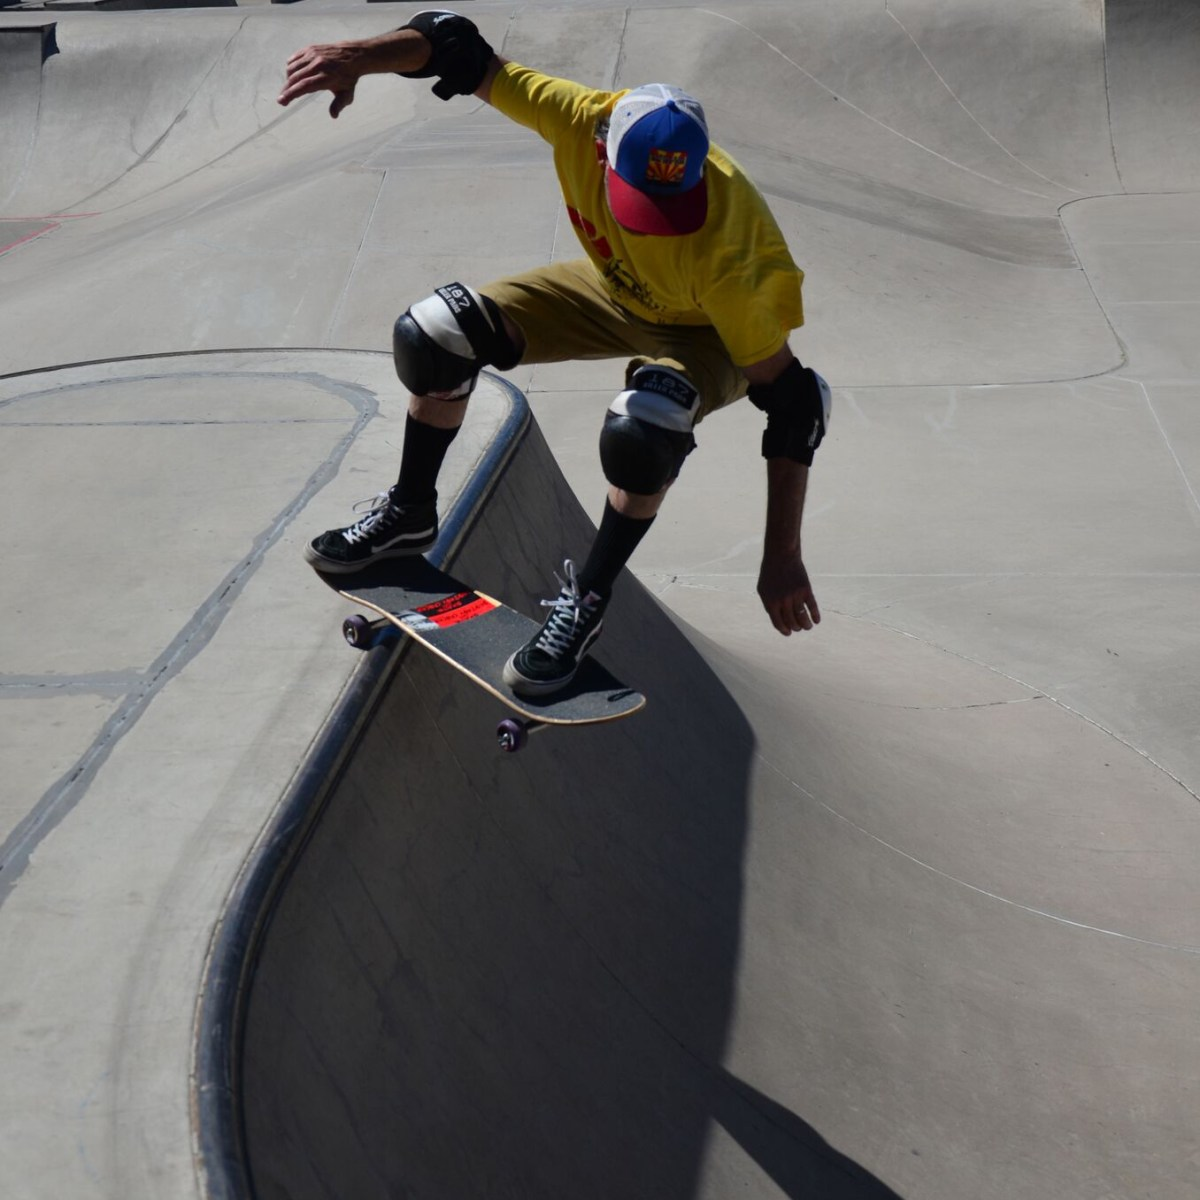 rob blogger u2013 azpx skateboards